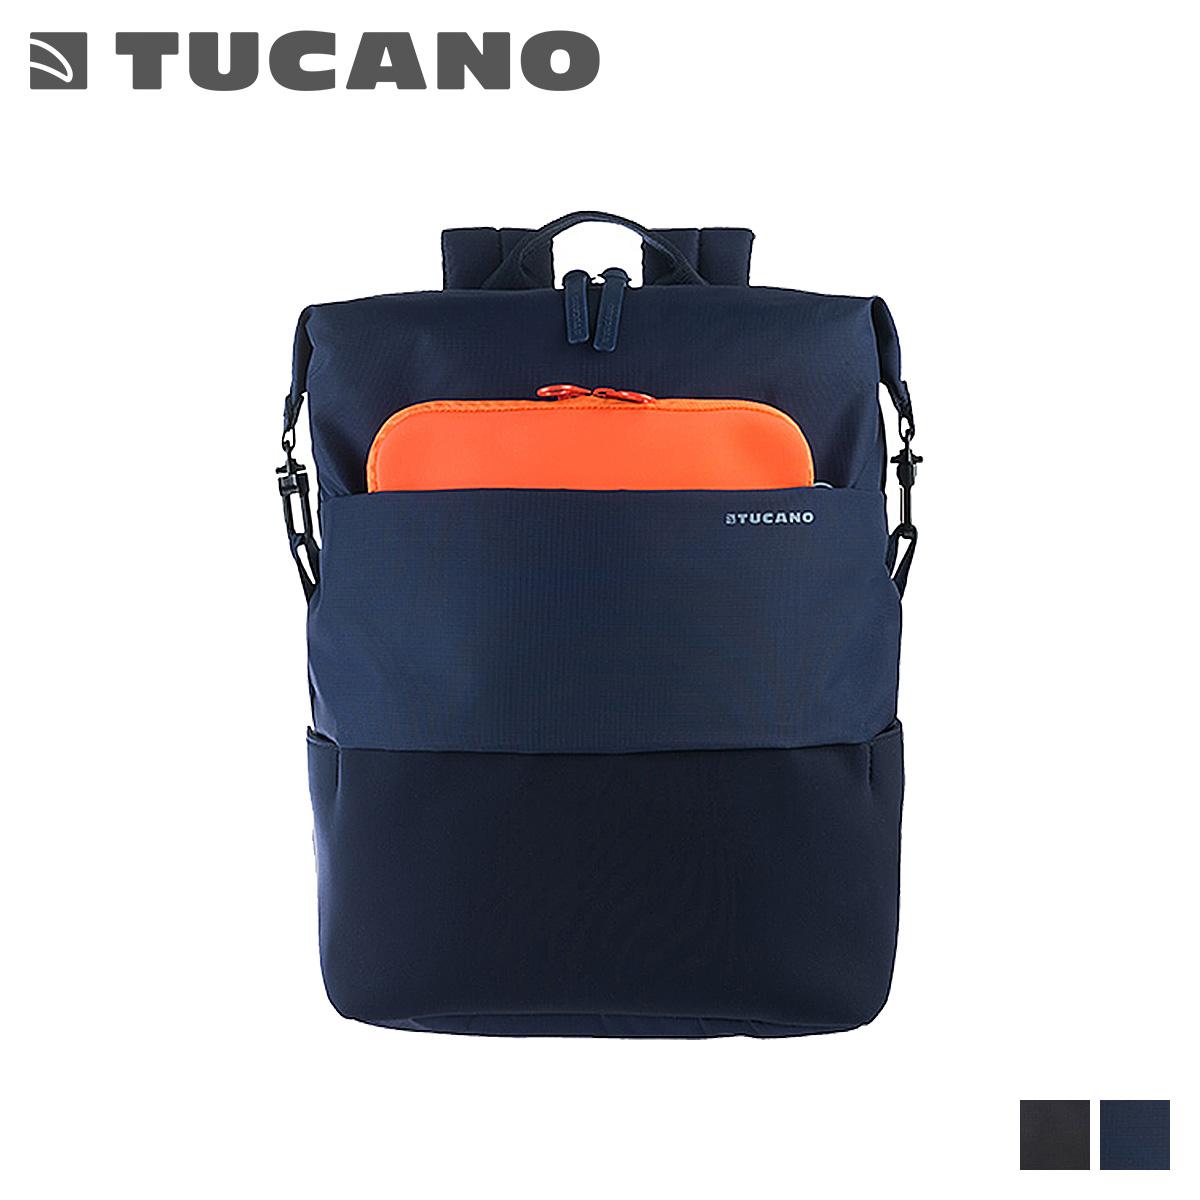 TUCANO MODO ツカーノ リュック バッグ バックパック メンズ レディース ブラック ブルー 黒 BMDOK